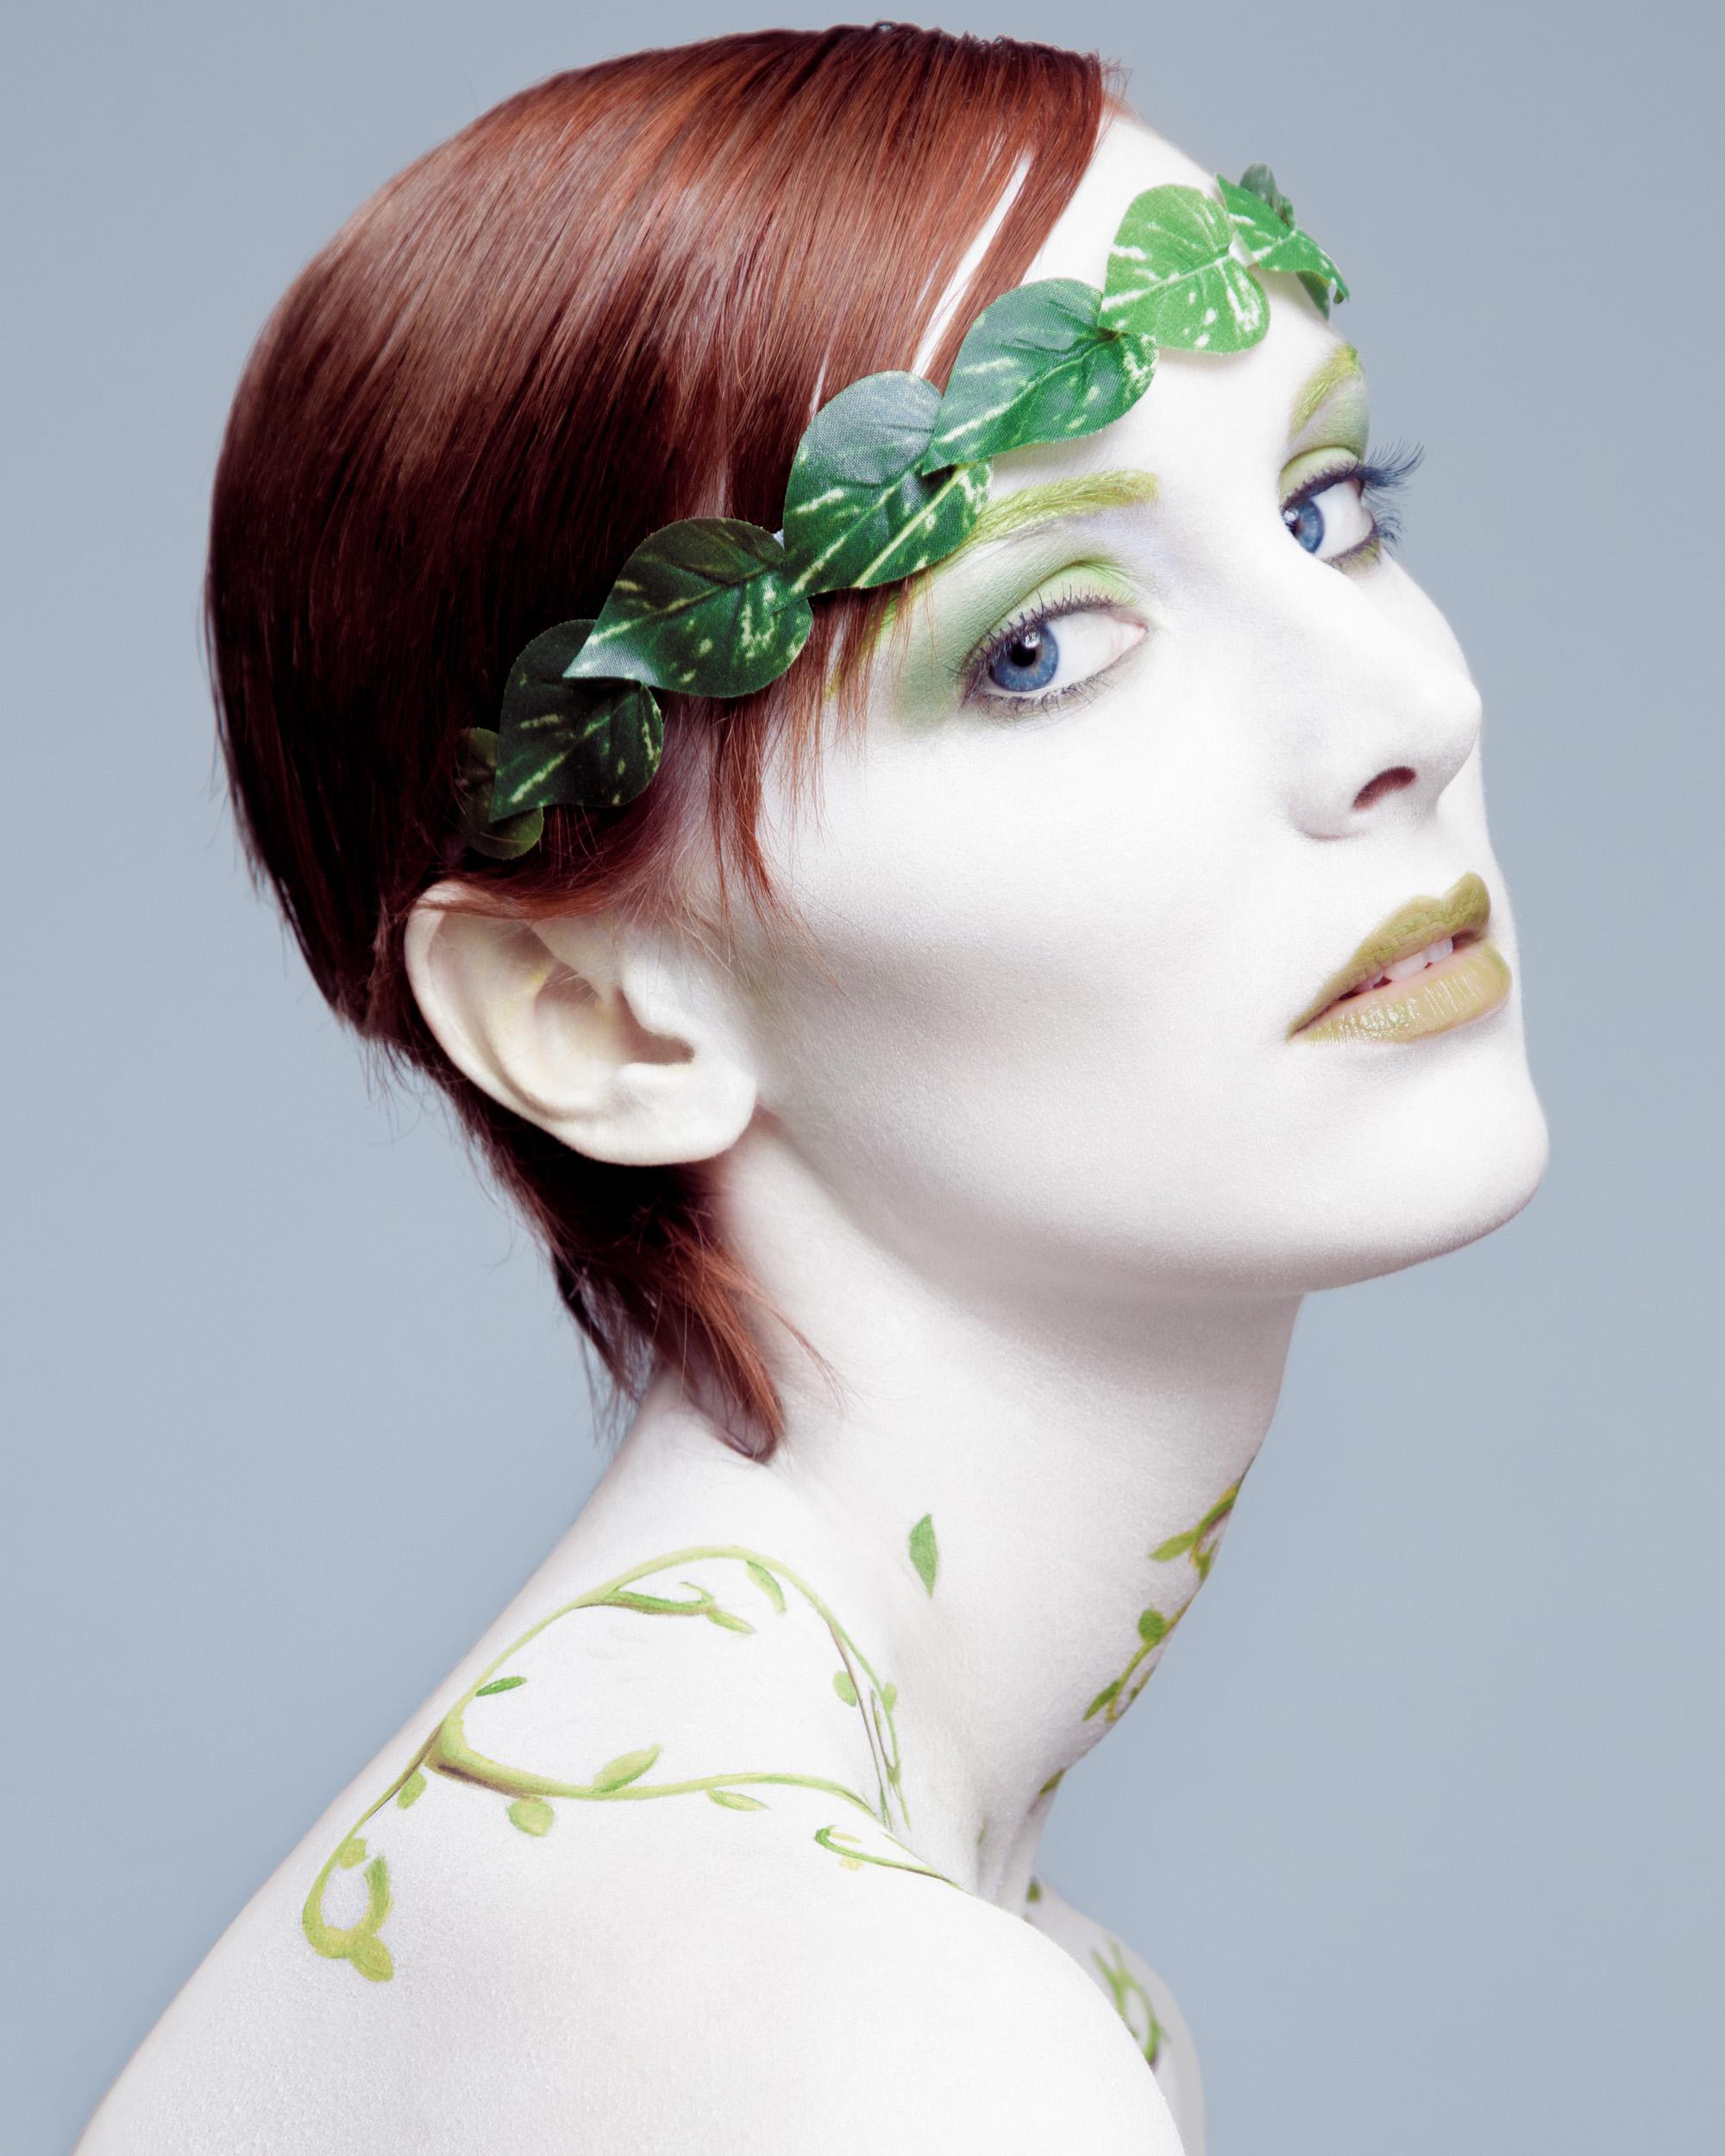 School of Makeup Arts Toronto: Portfolio Shoot